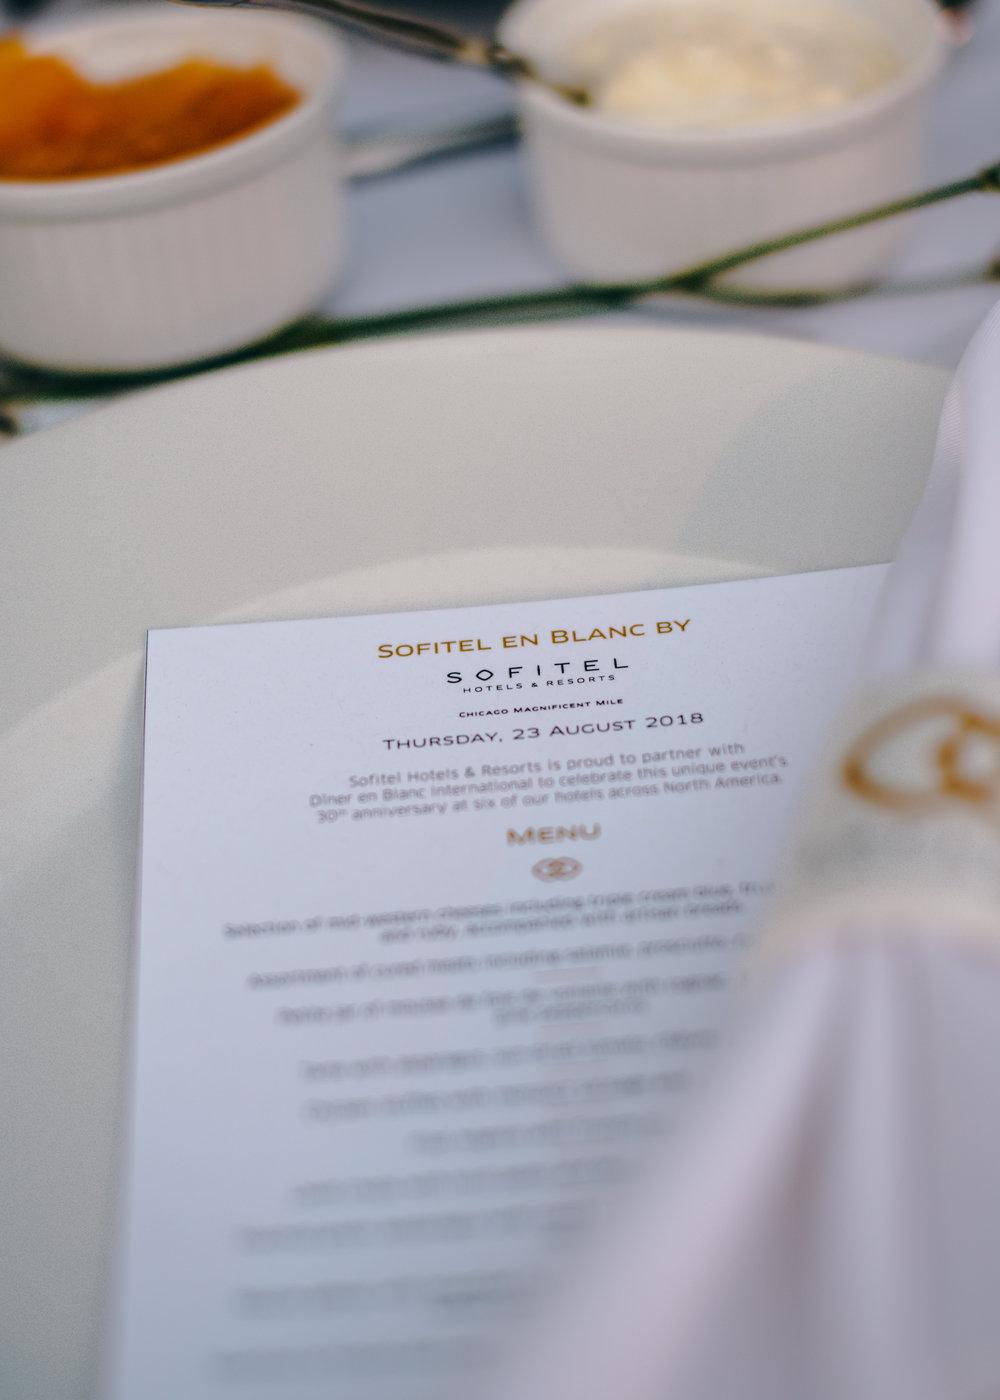 sofitel-en-blanc-chicago-by-lisa-linh